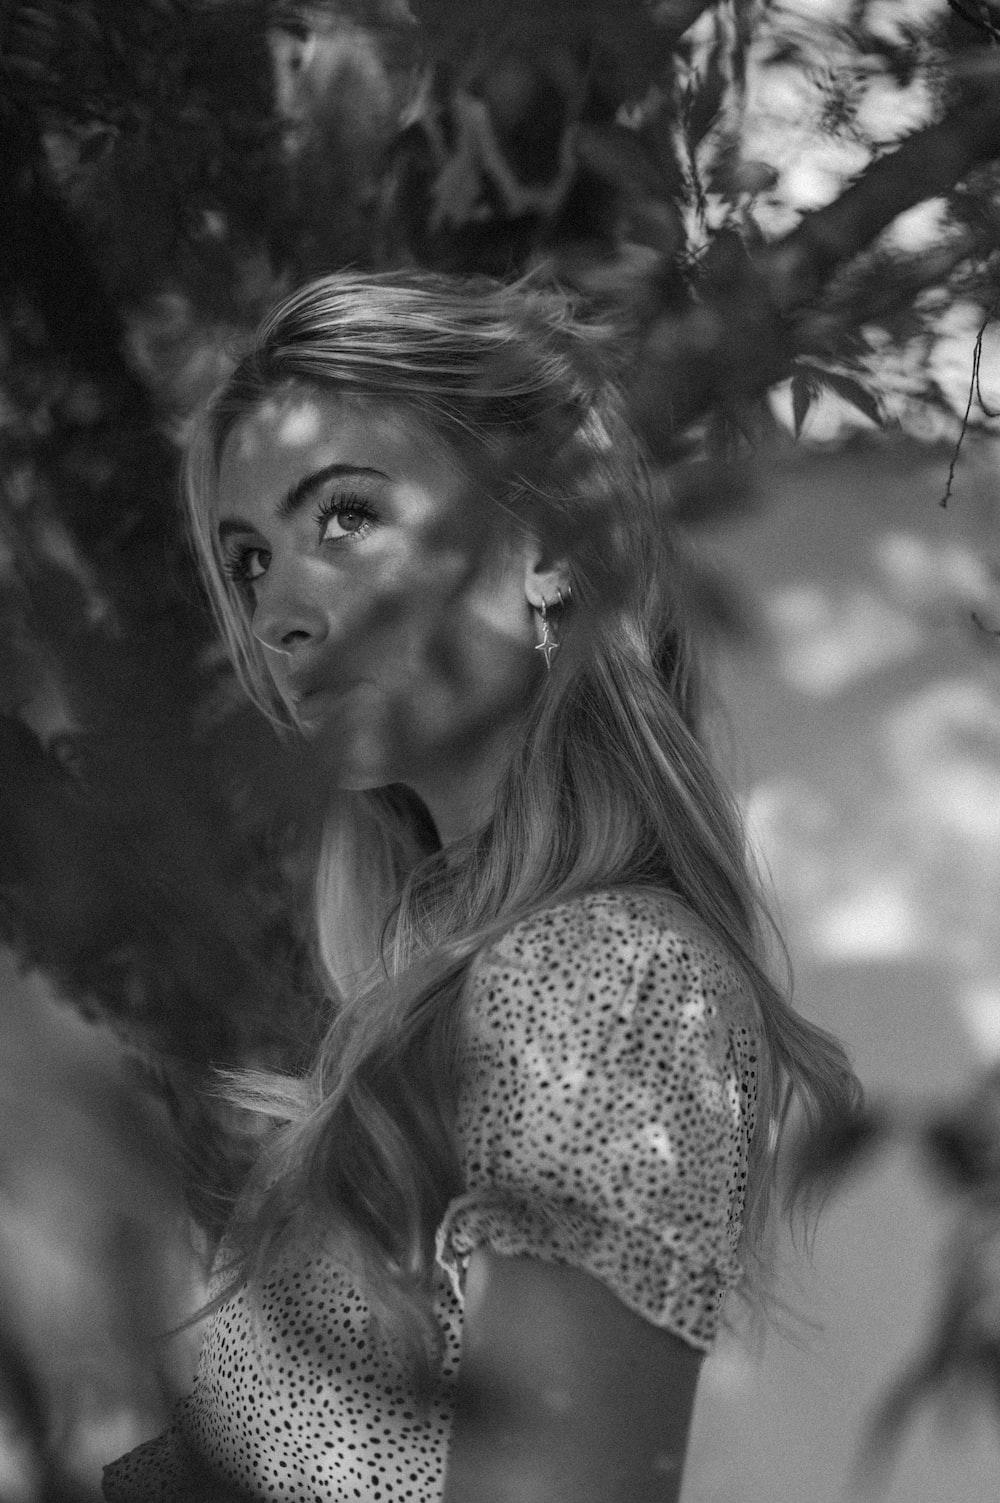 grayscale photo of woman in polka dot shirt